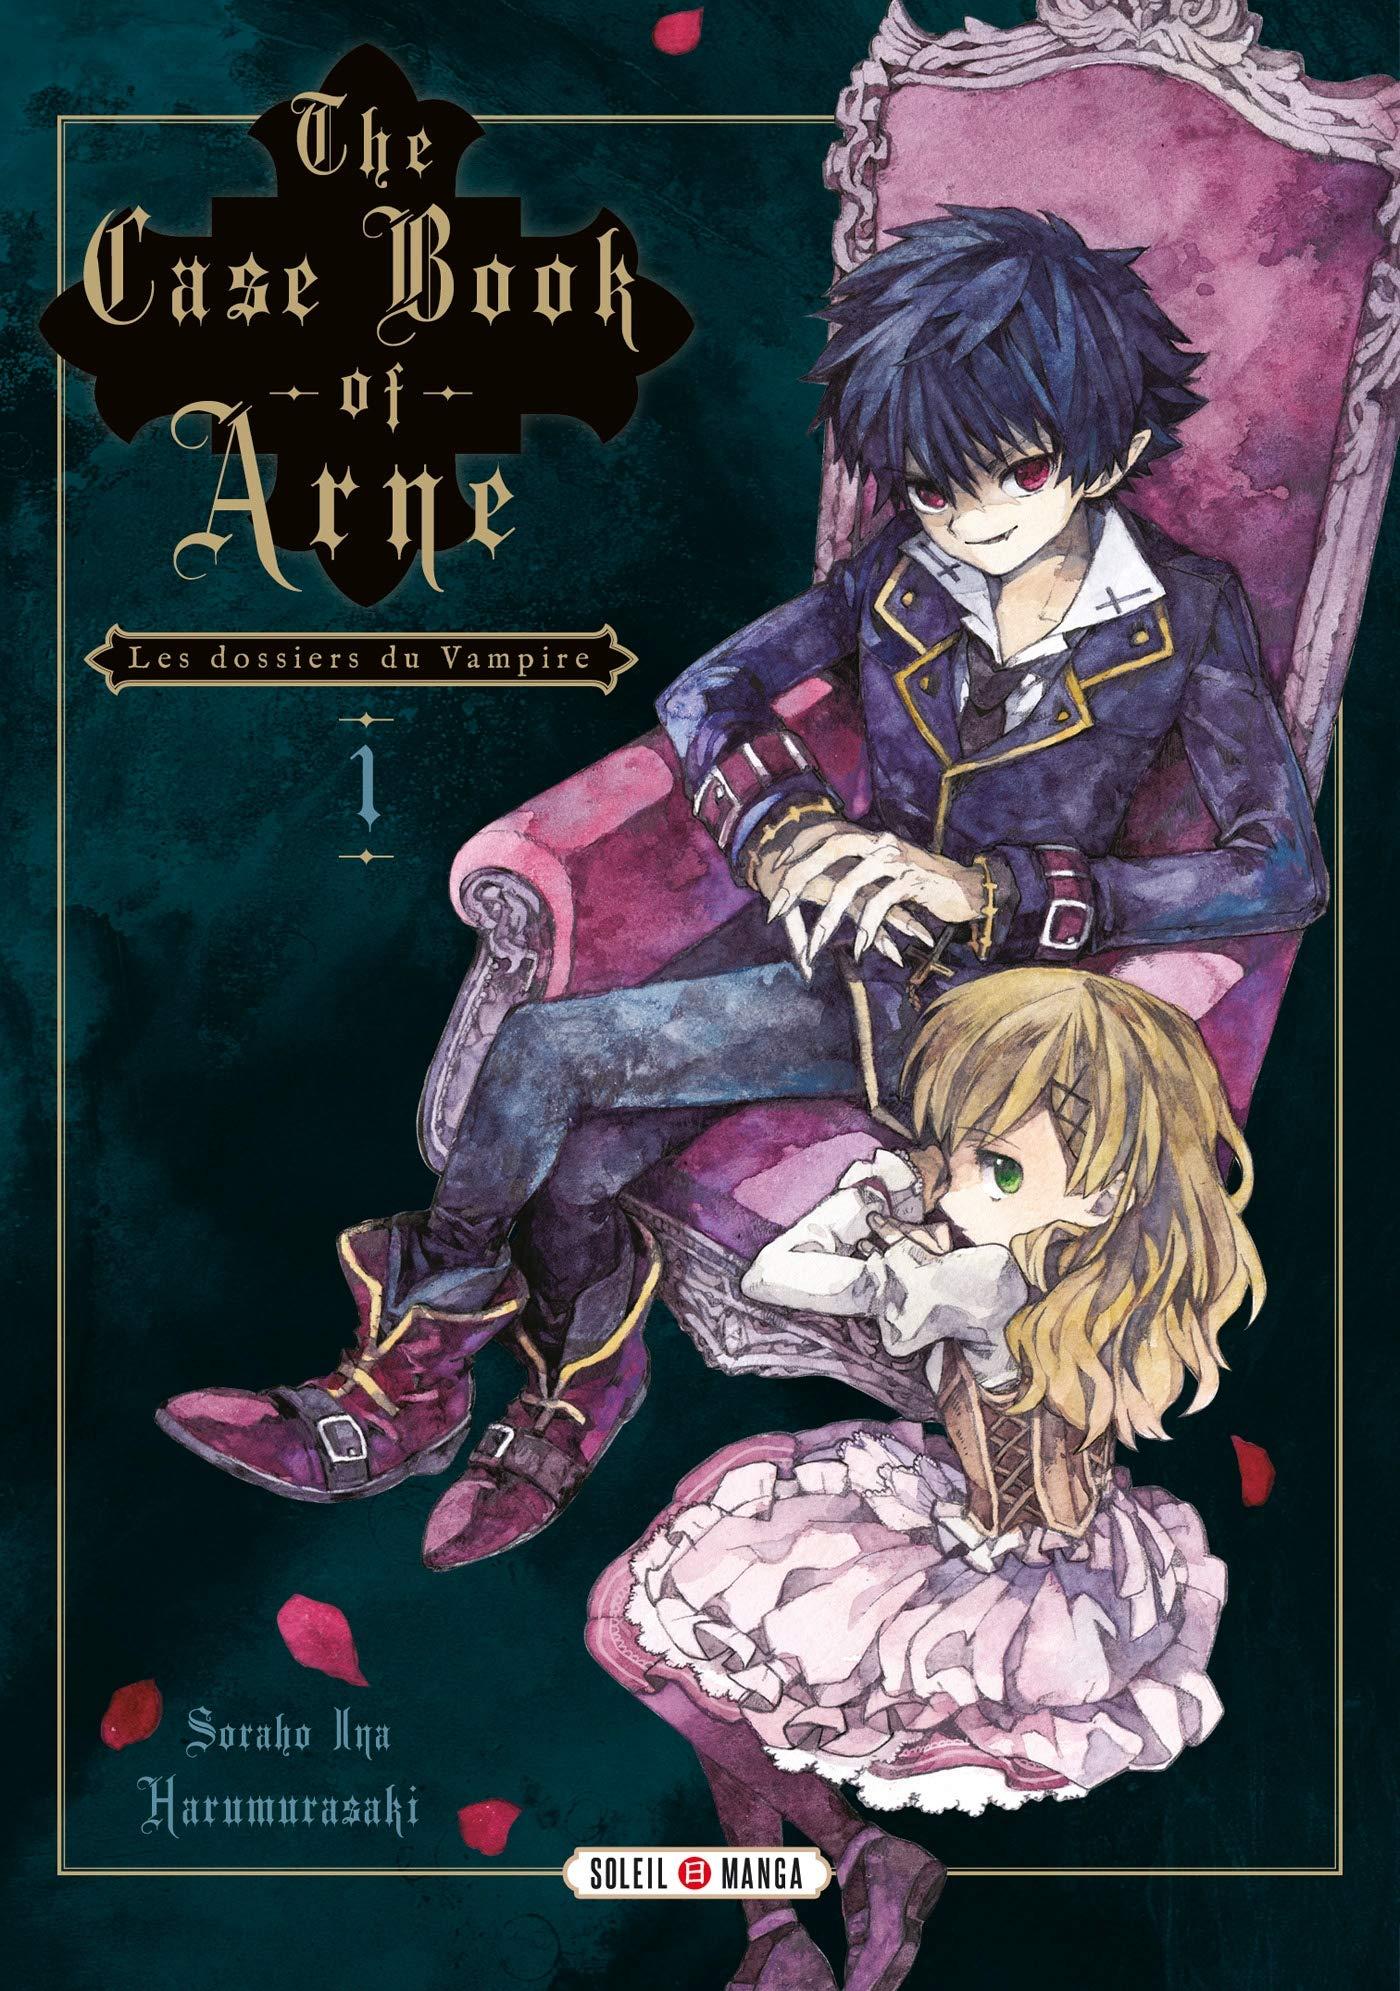 The Case Book of Arne - Les Dossiers du Vampire 1